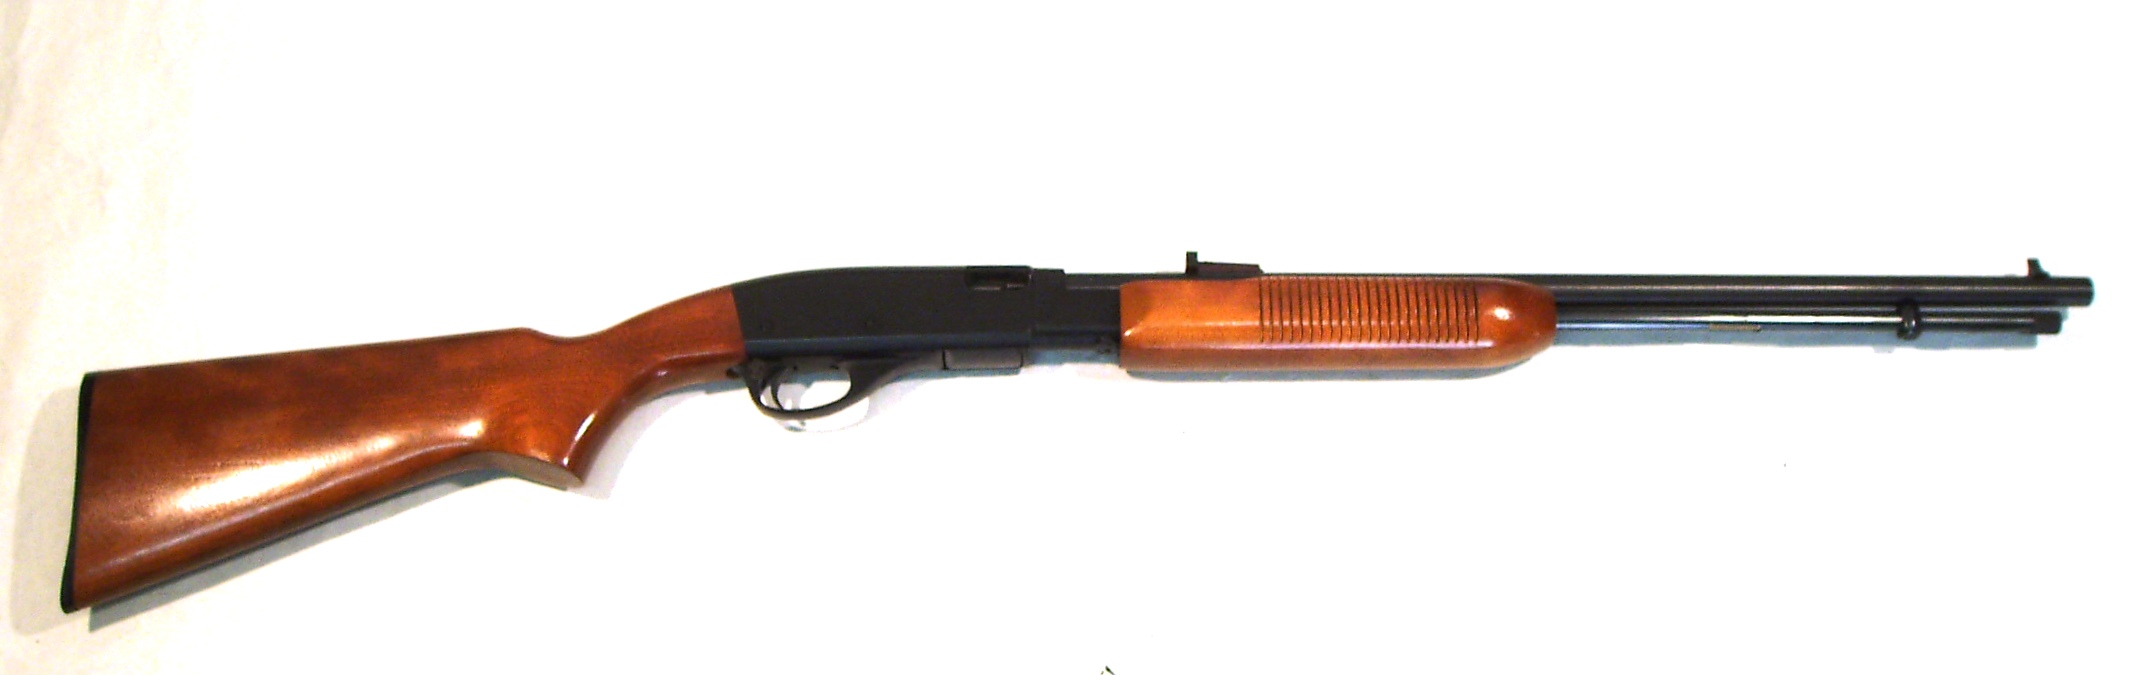 Carabina REMINGTON, modelo 572 FIELD MASTER, calibre 22 S.L.LR., nº A1436215-0